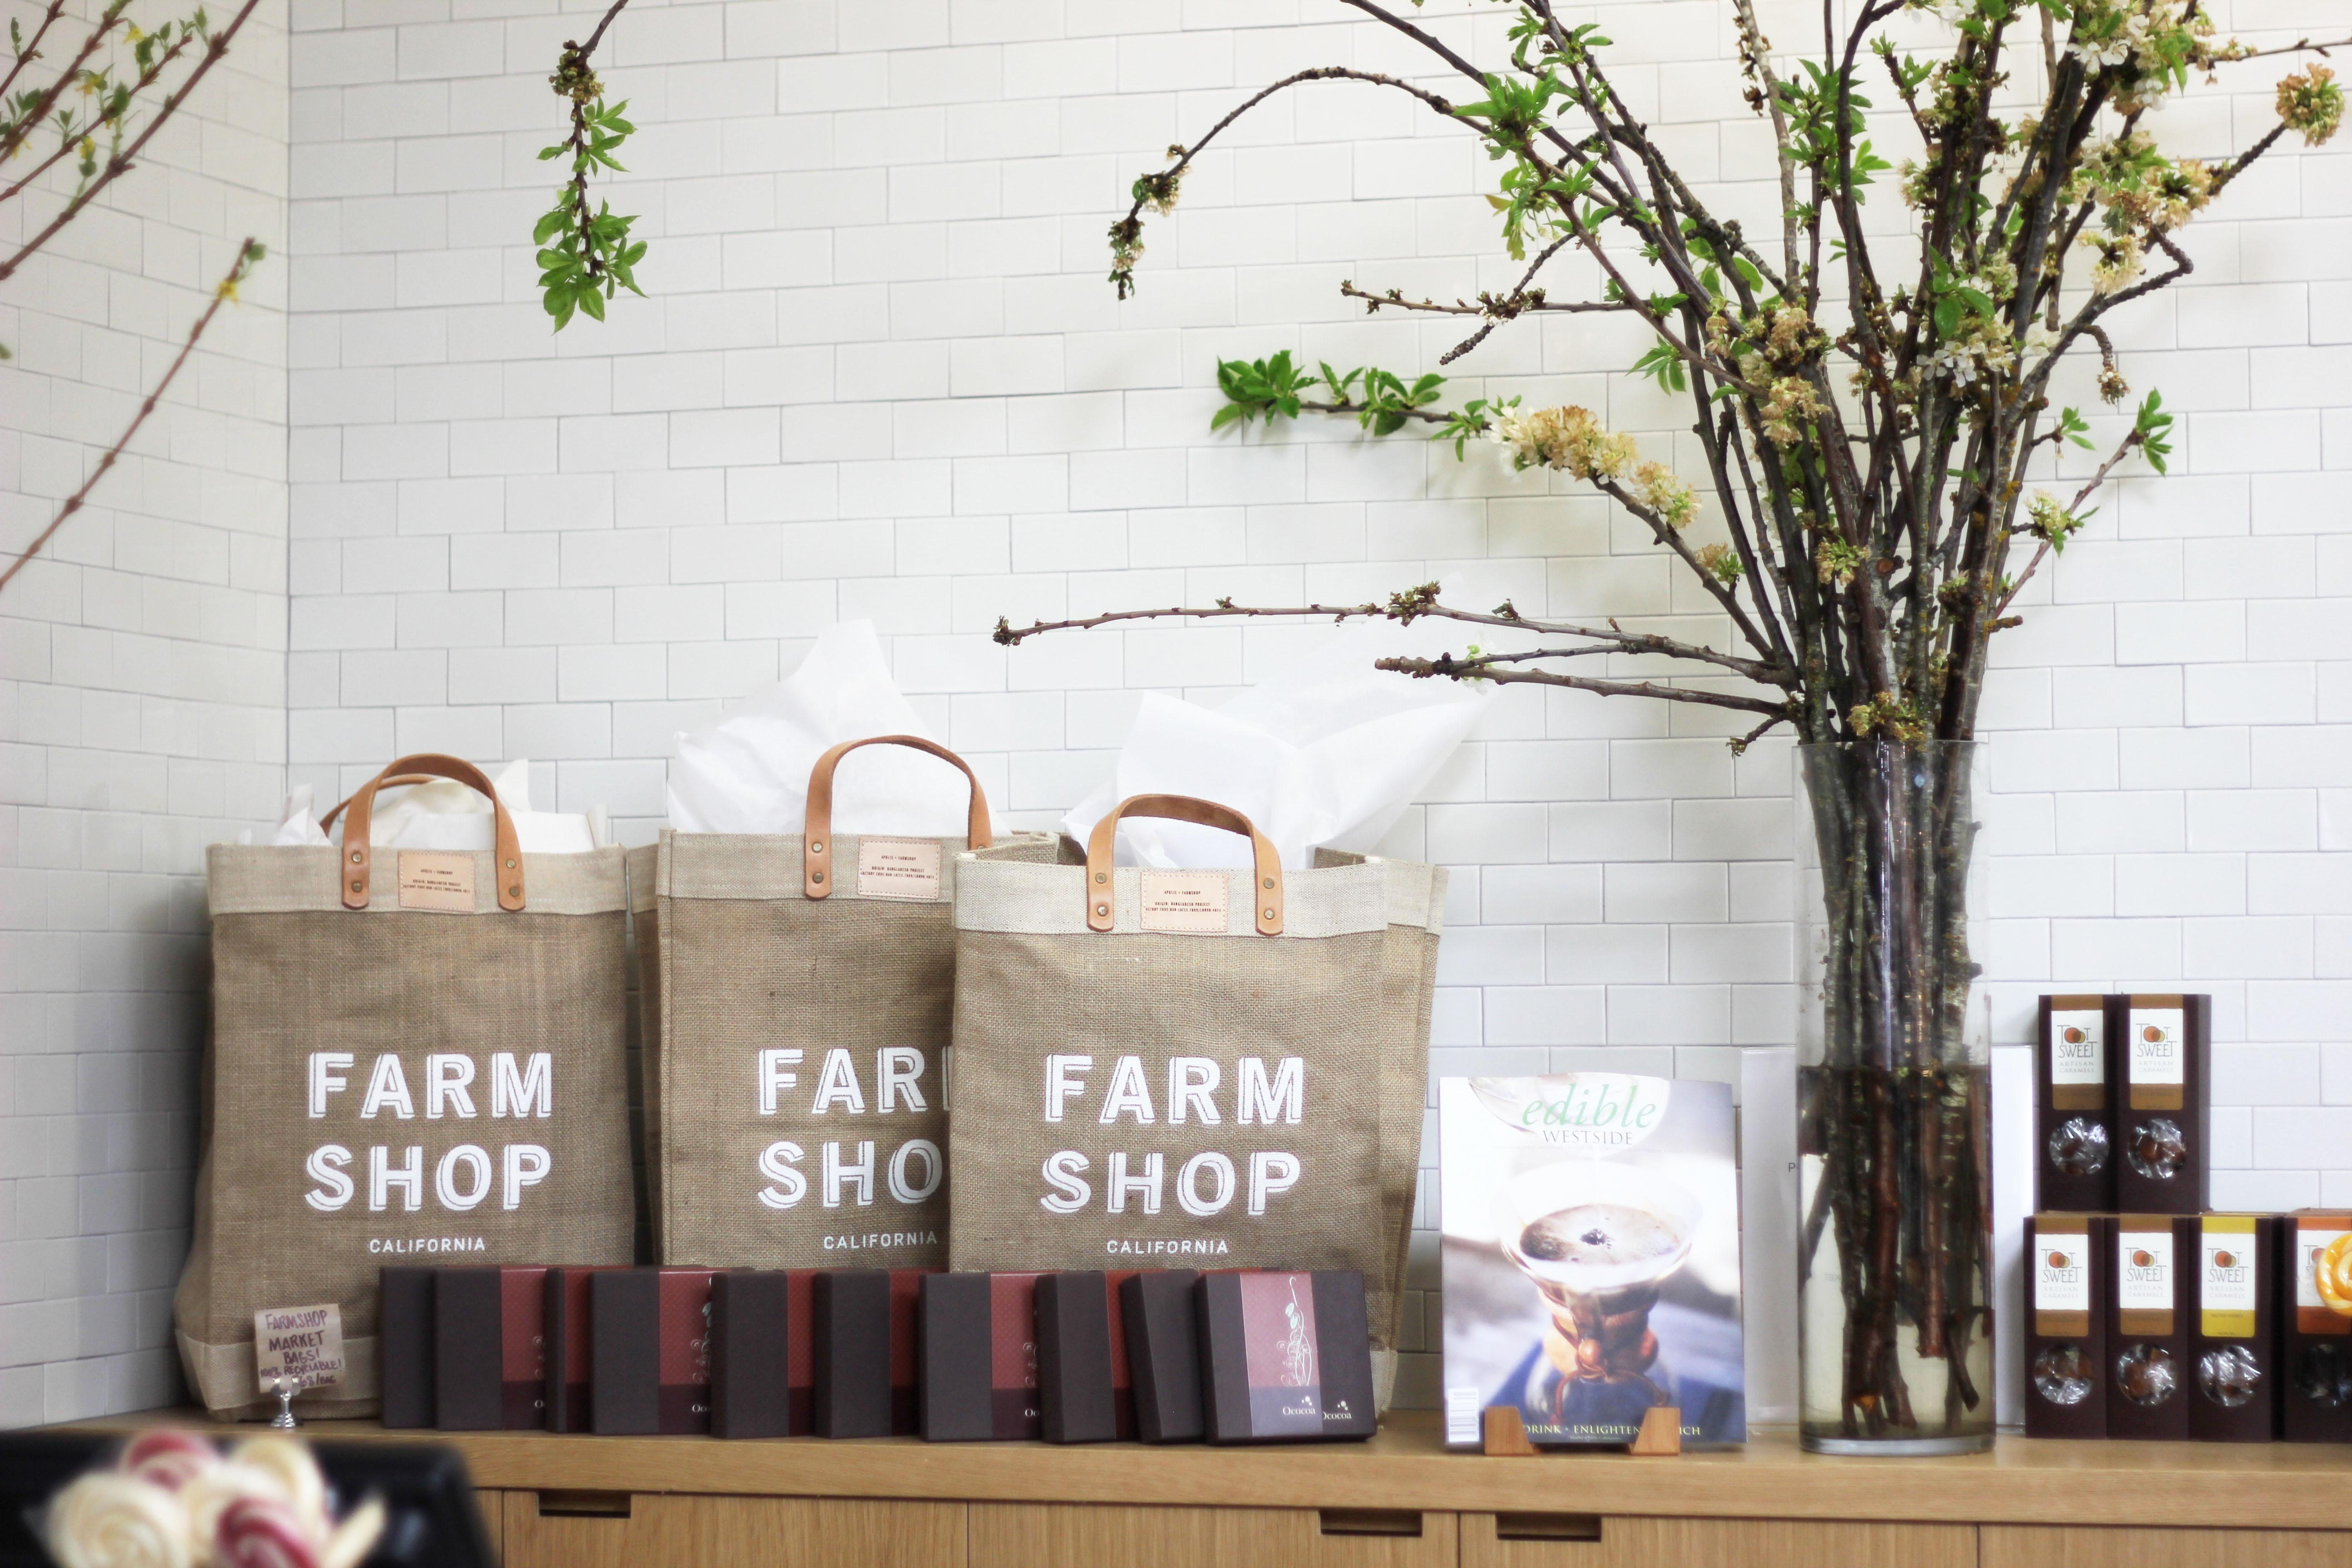 Around Town: Farmshop, Santa Monica   A Dash of Cinema